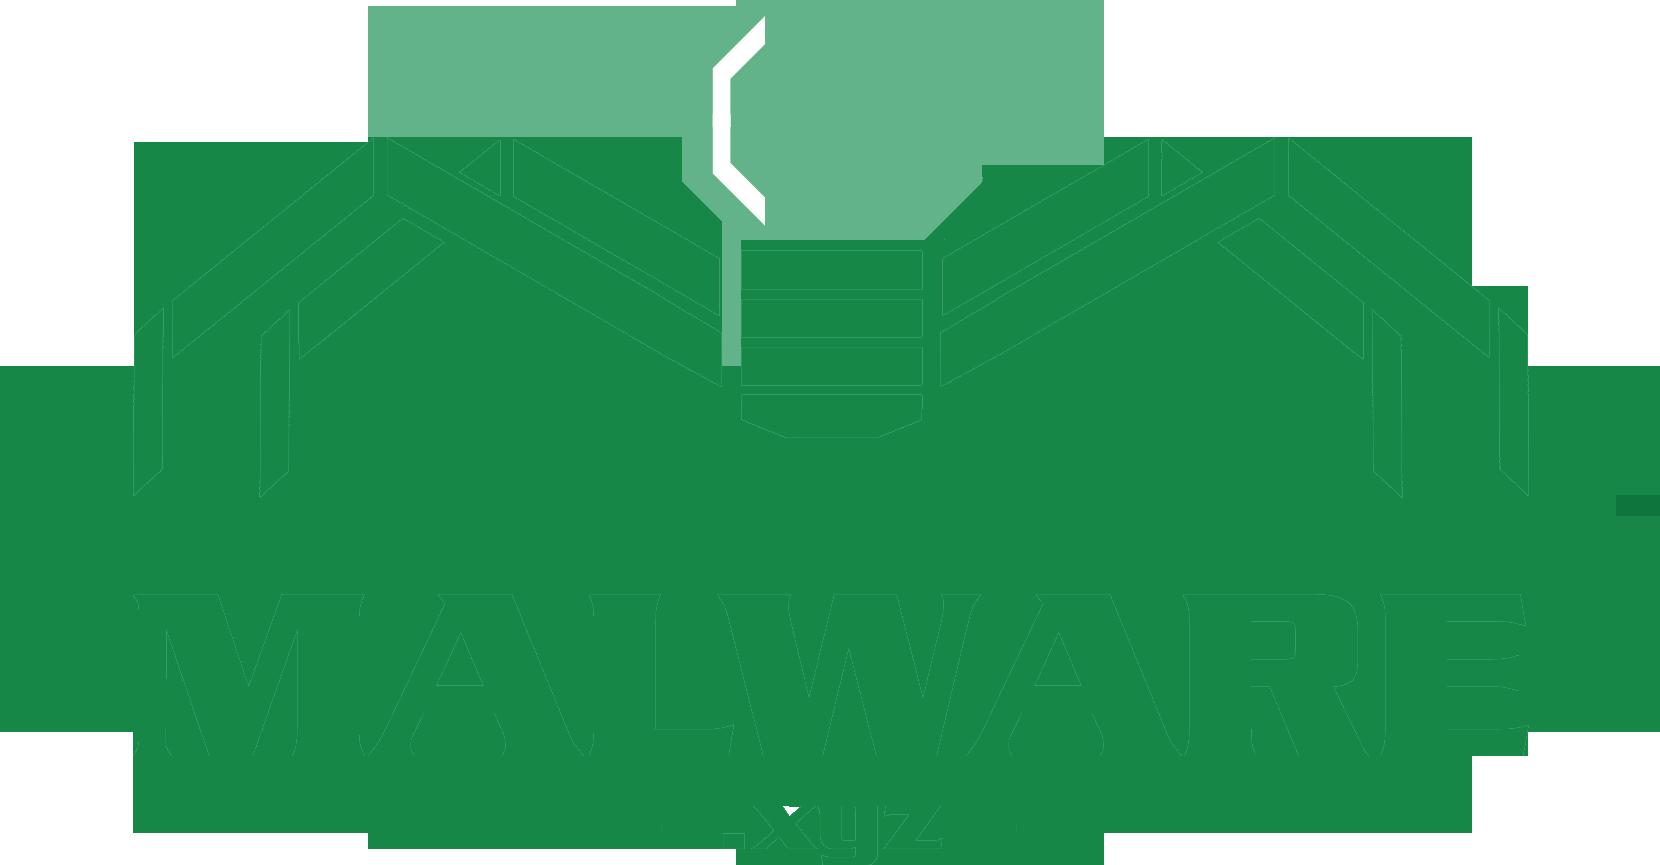 Malware.xyz